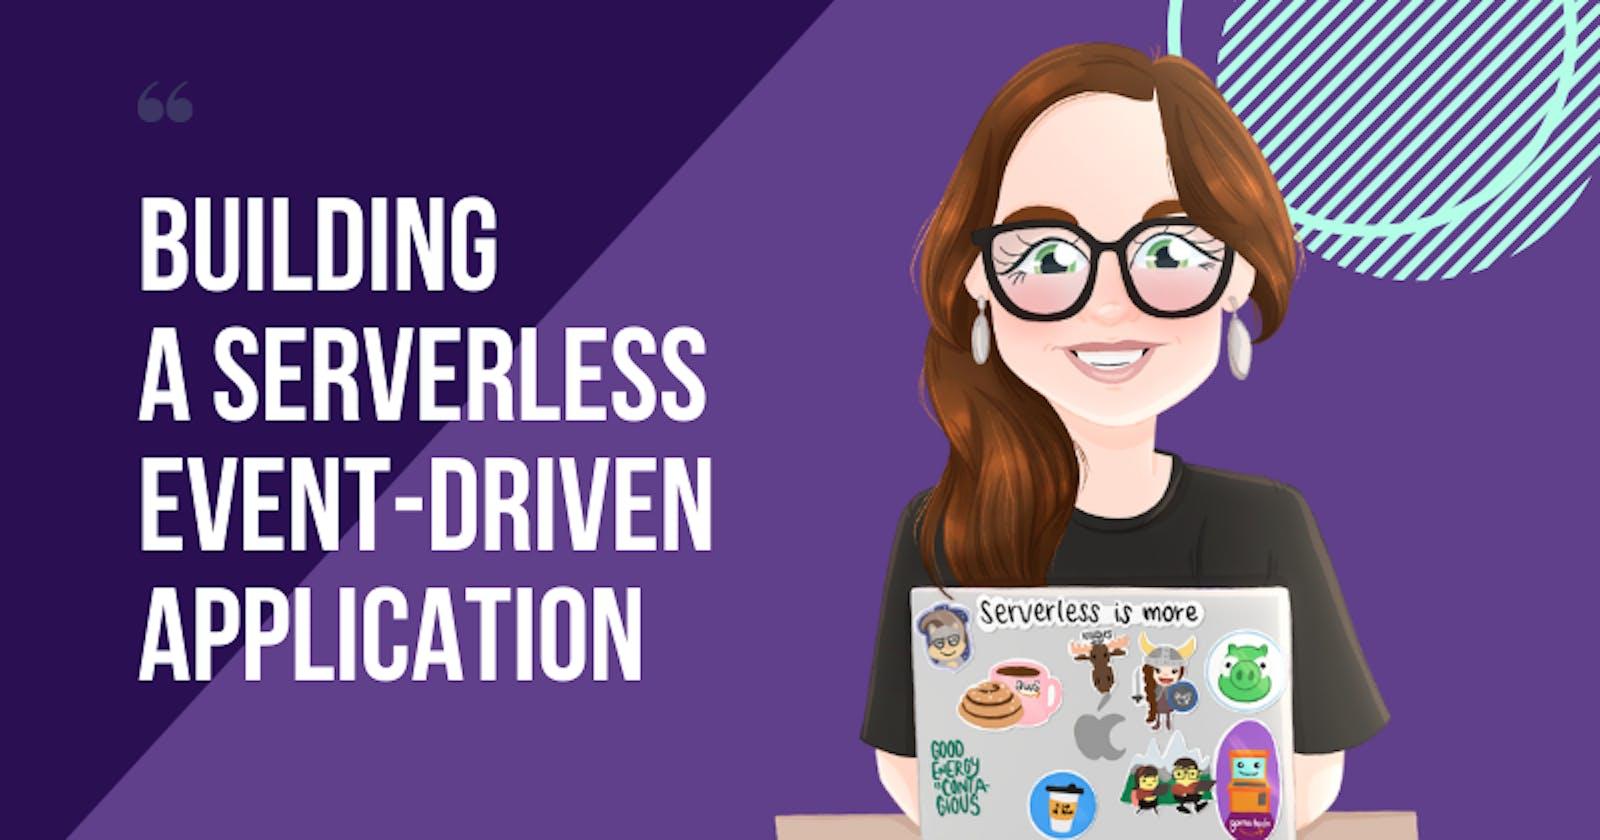 Building a Serverless Event-driven Application